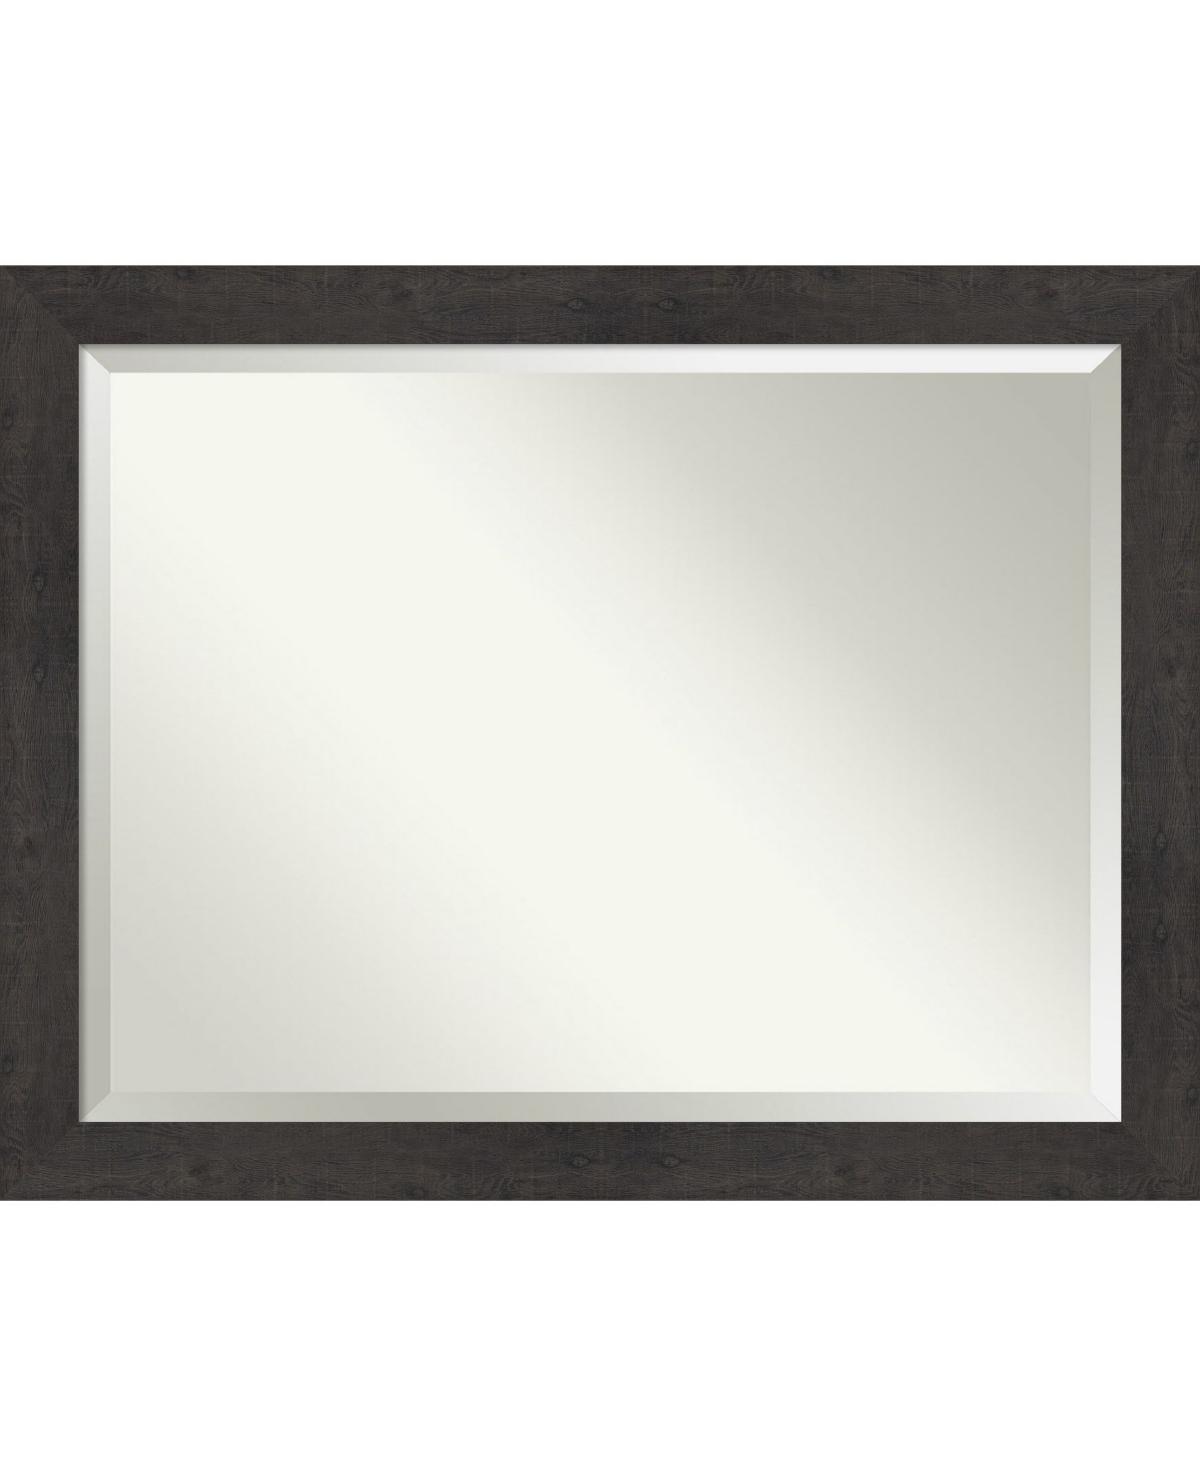 Amanti Art Rustic Plank Framed Bathroom Vanity Wall Mirror, 45.38